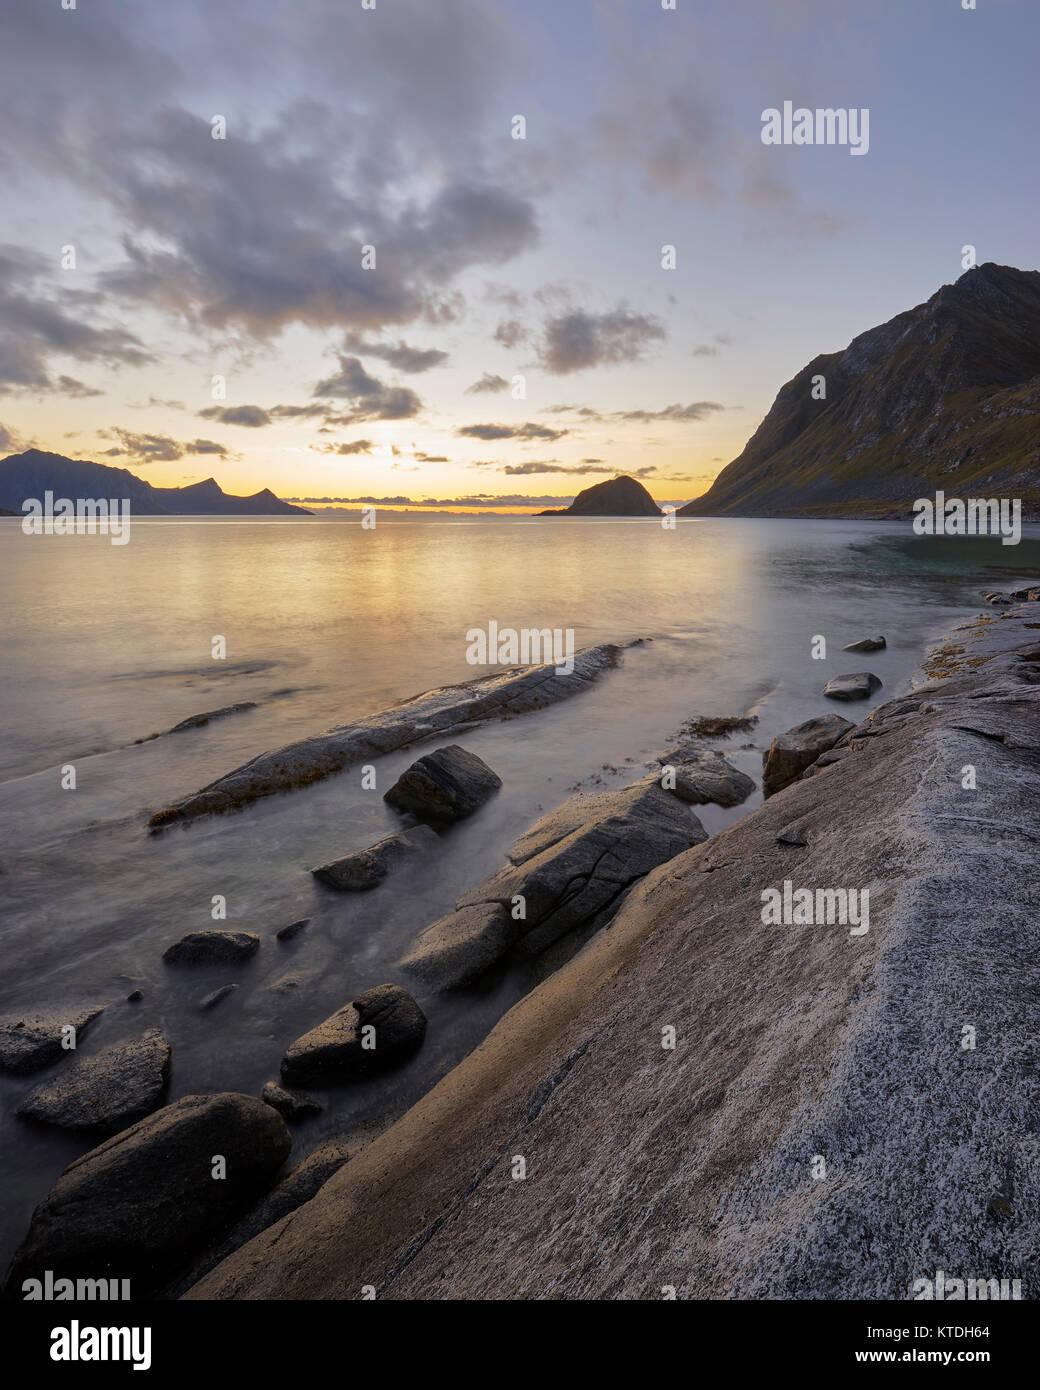 Haukland beach, Vestvagoy, Lofoten, Nordland, Norway at sunset - Stock Image